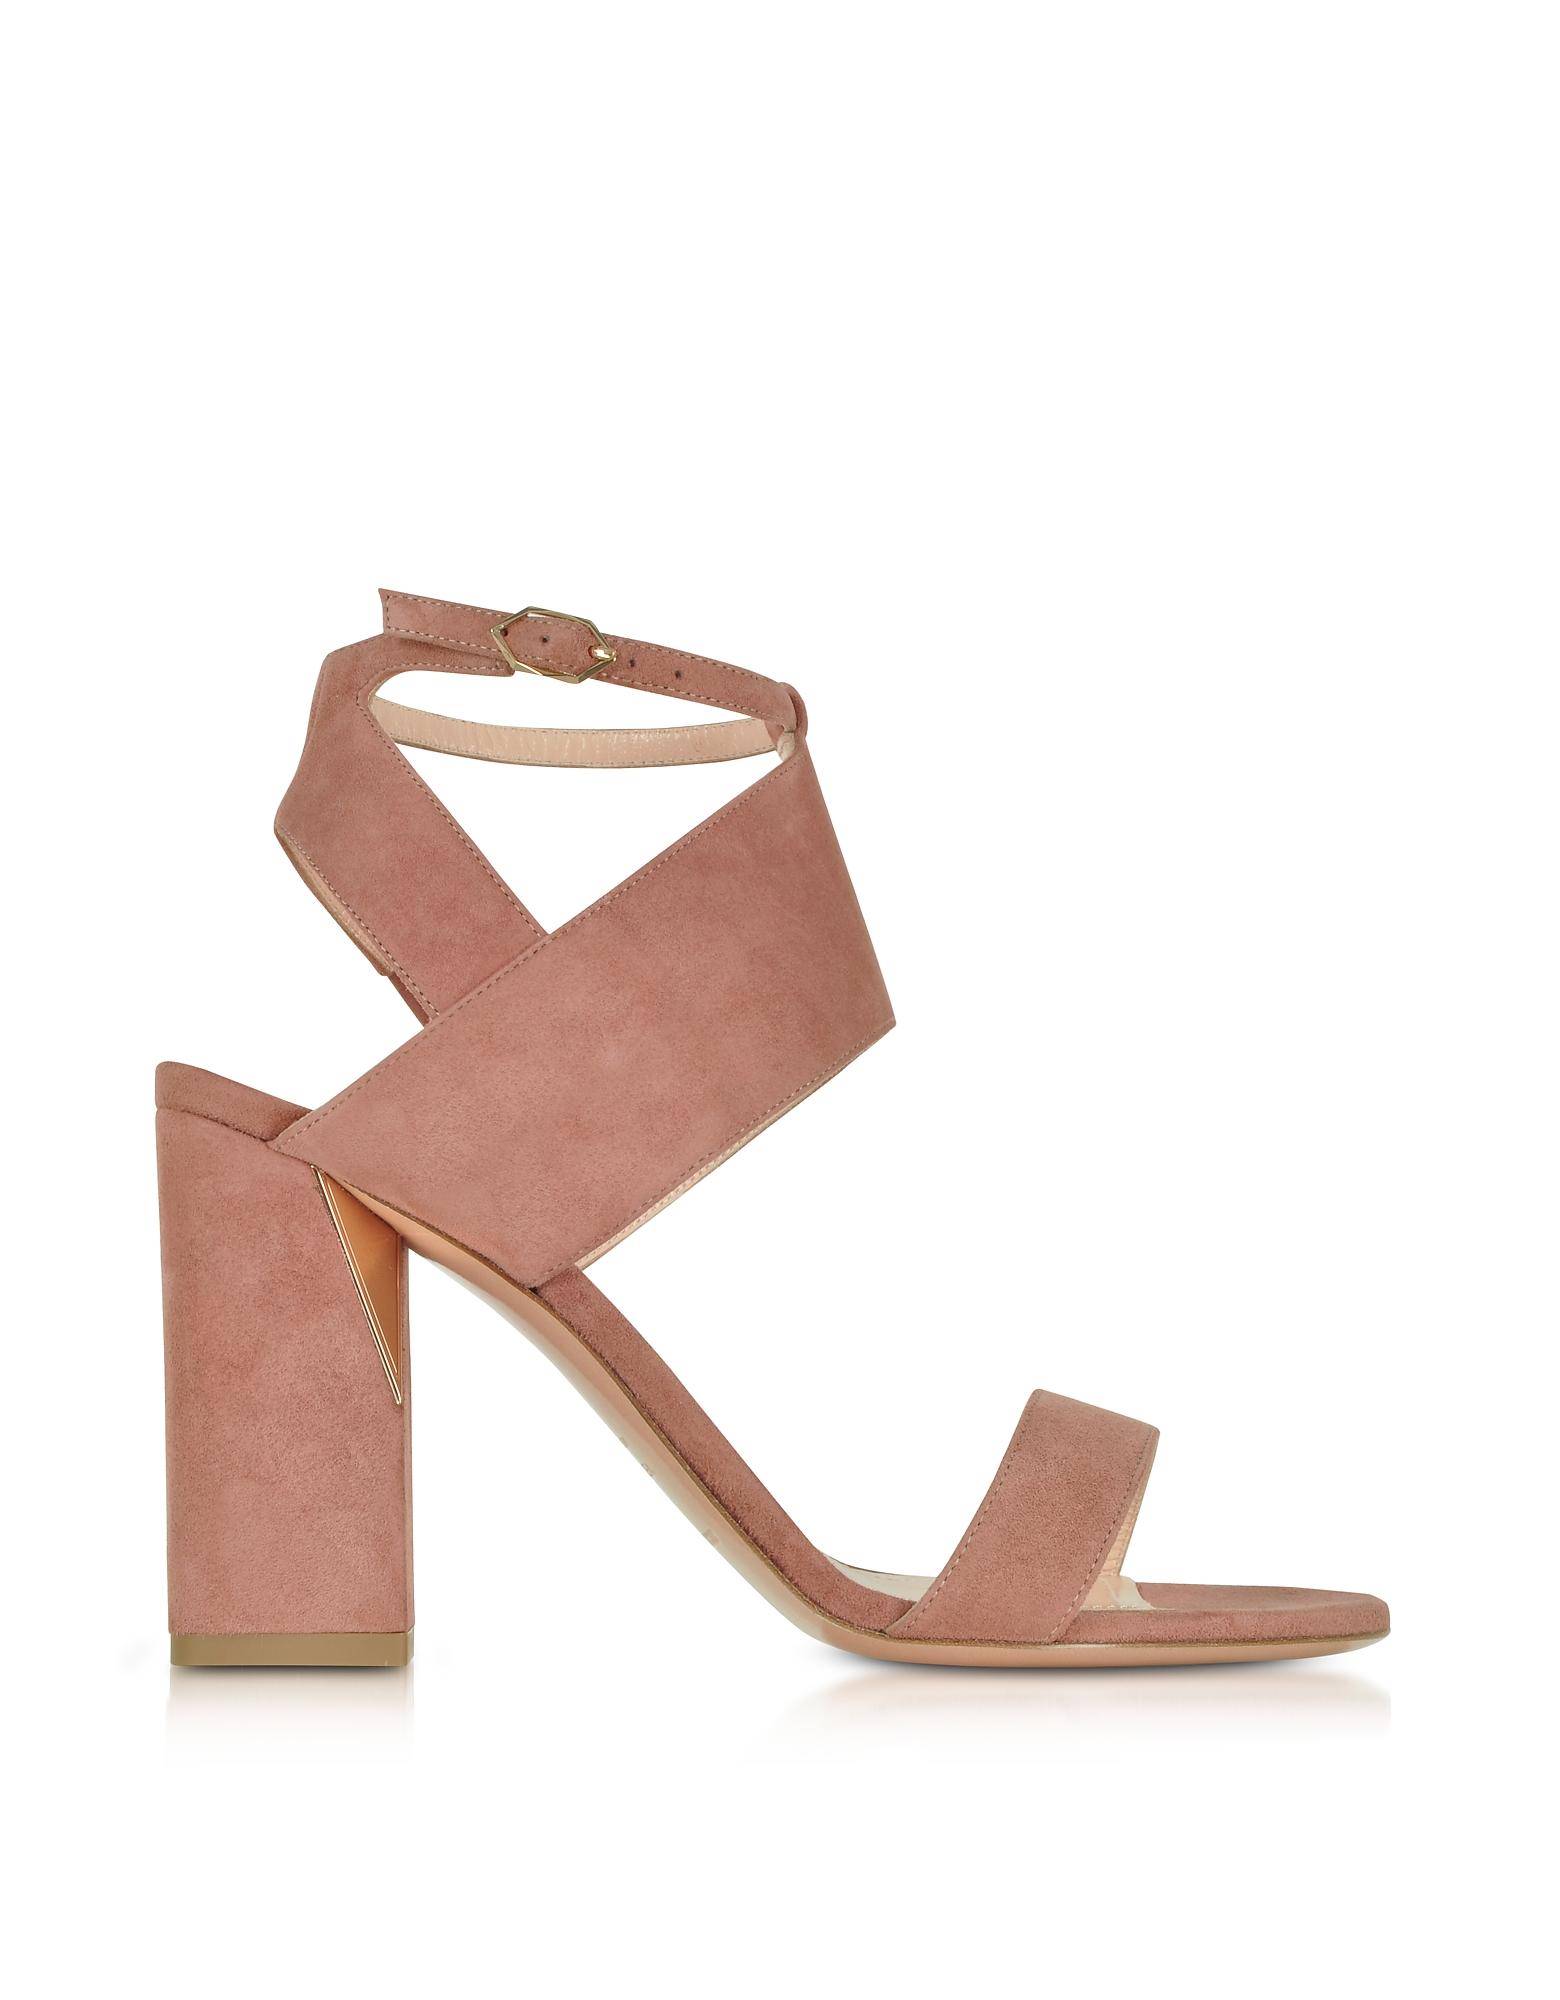 Nicholas Kirkwood Shoes, Rosewood Suede 90mm Eva Sandals